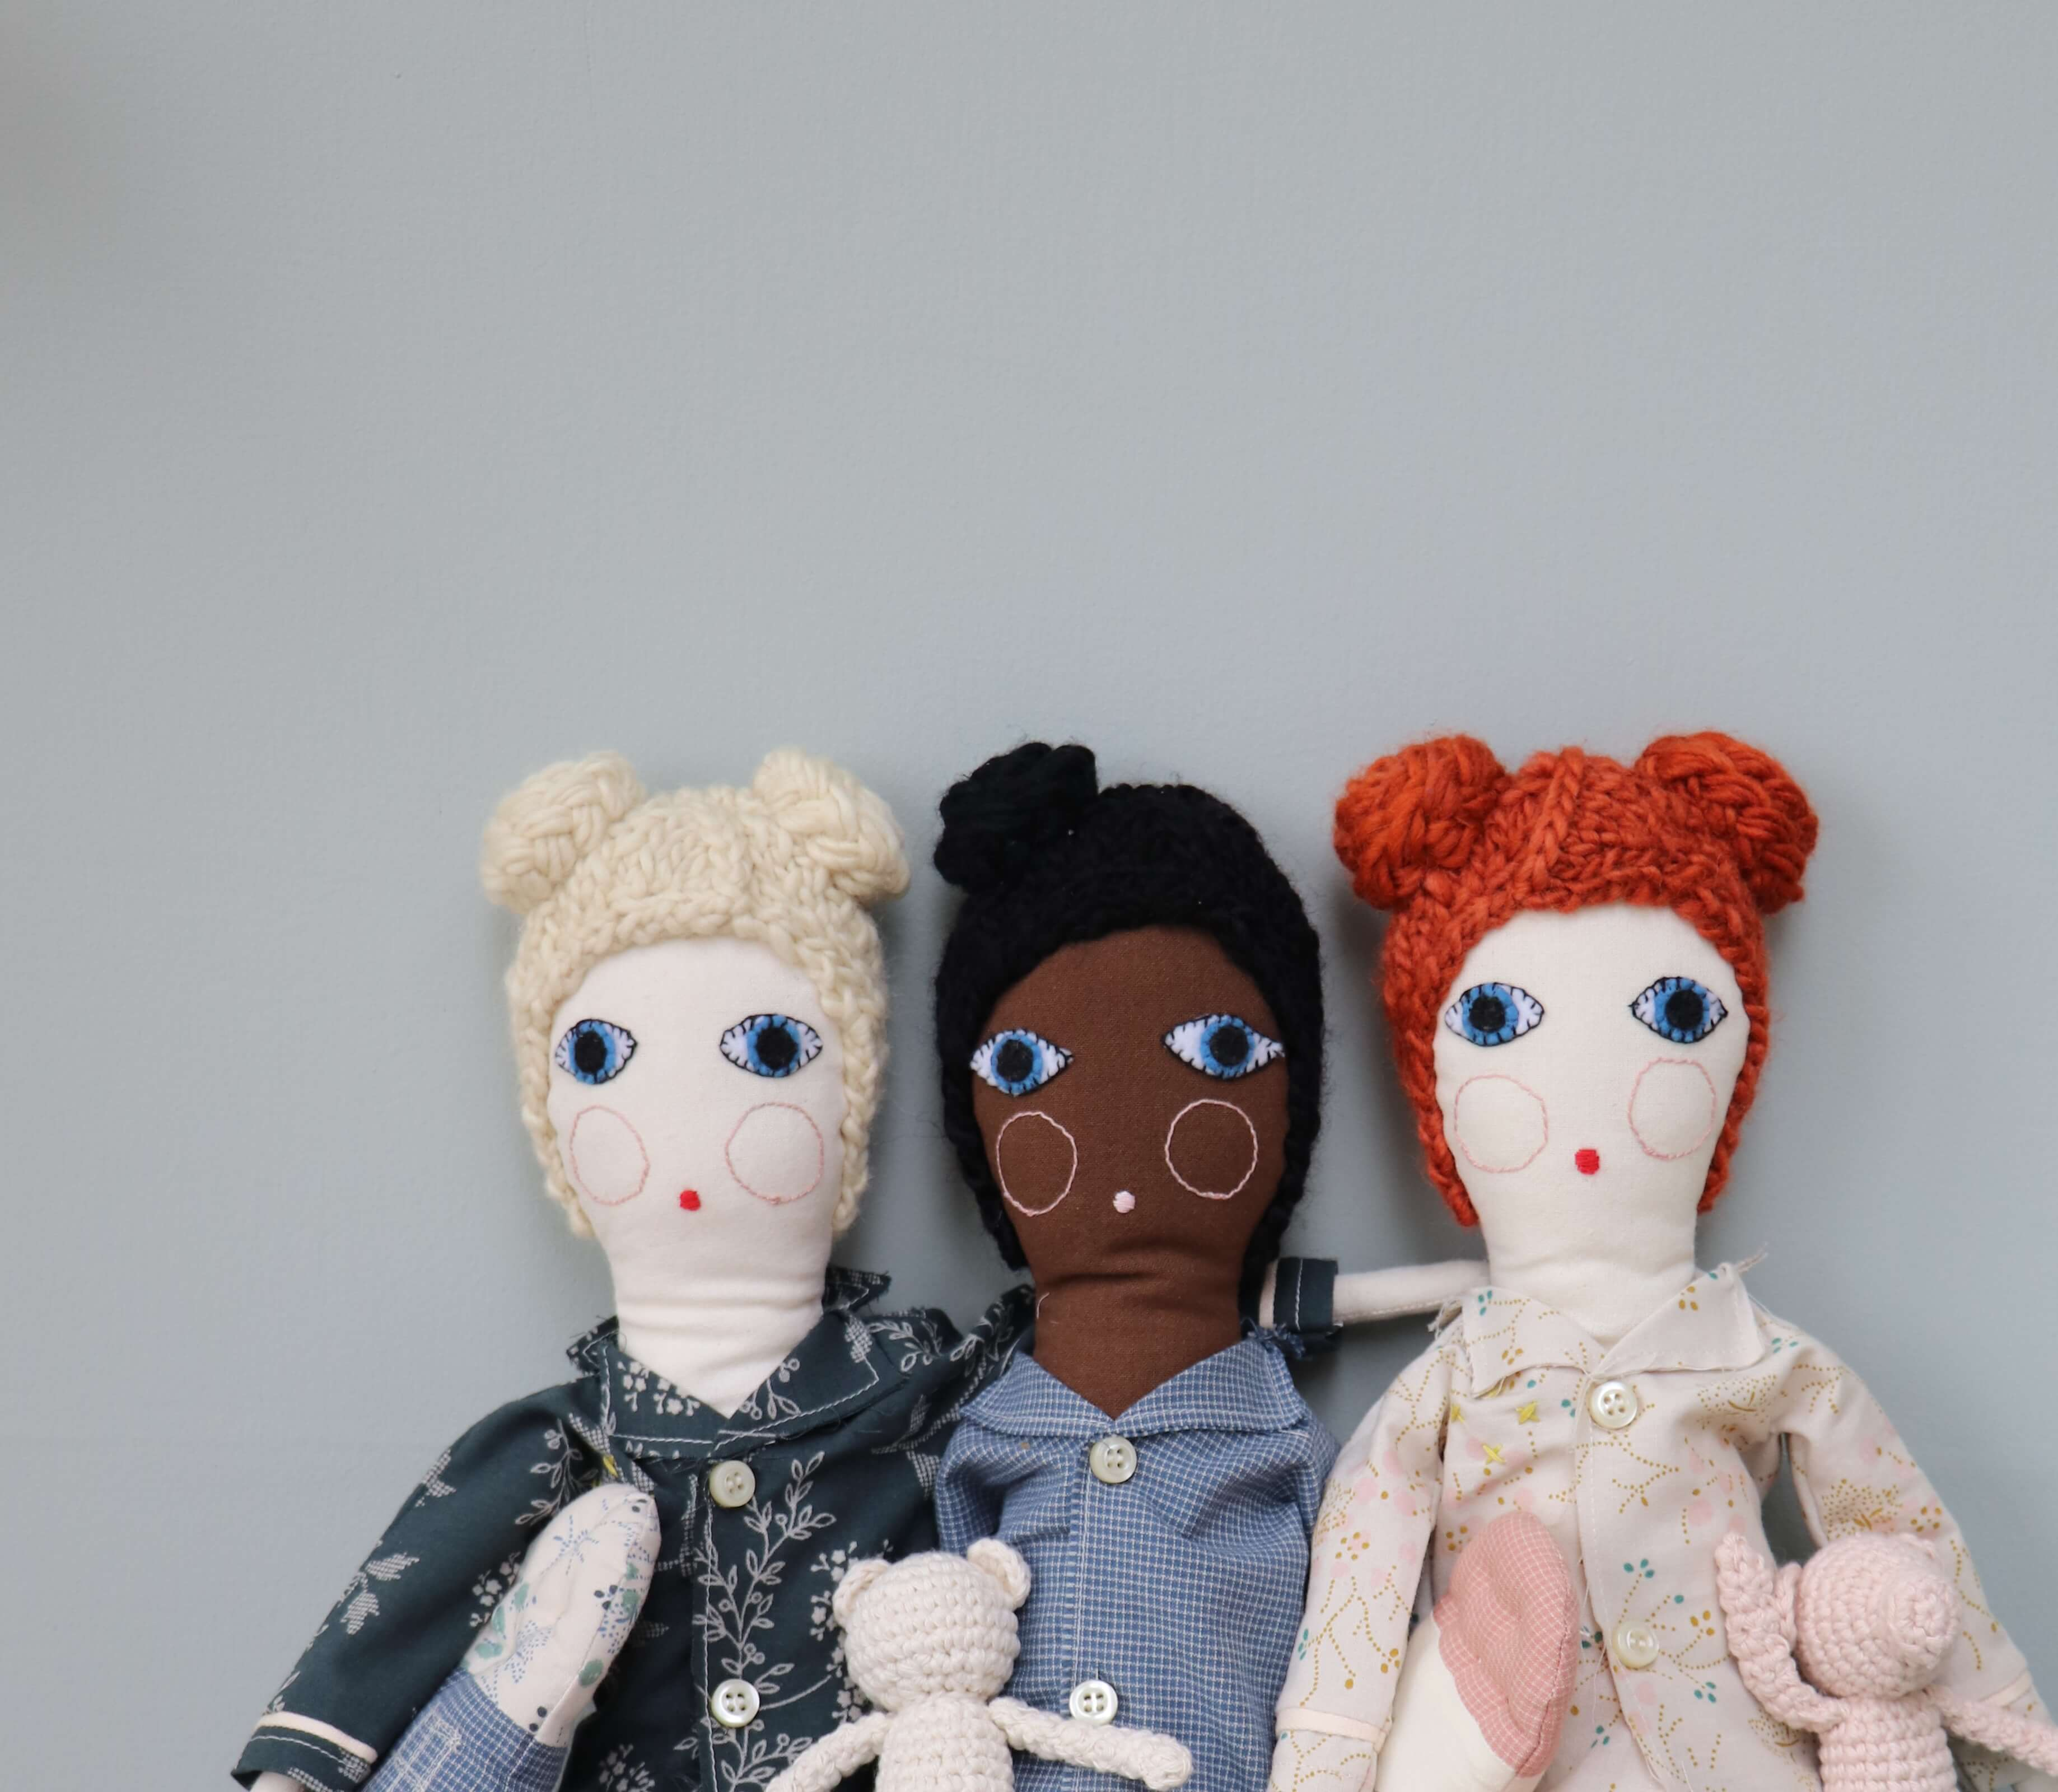 Severina Kids X Camomile London collaboration